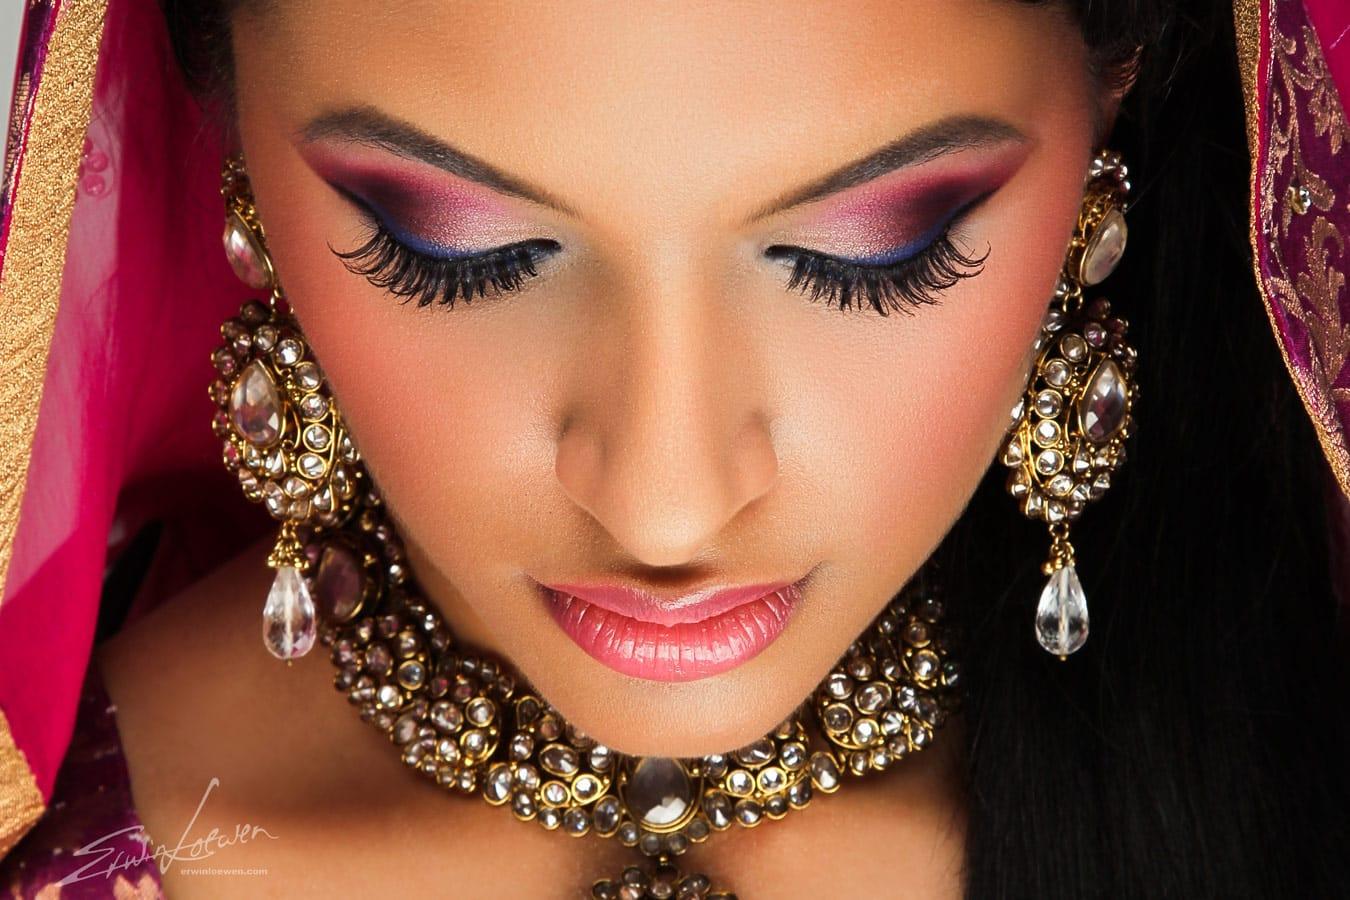 Top Maquillage indienne, je teste cette nouvelle tendance WF15